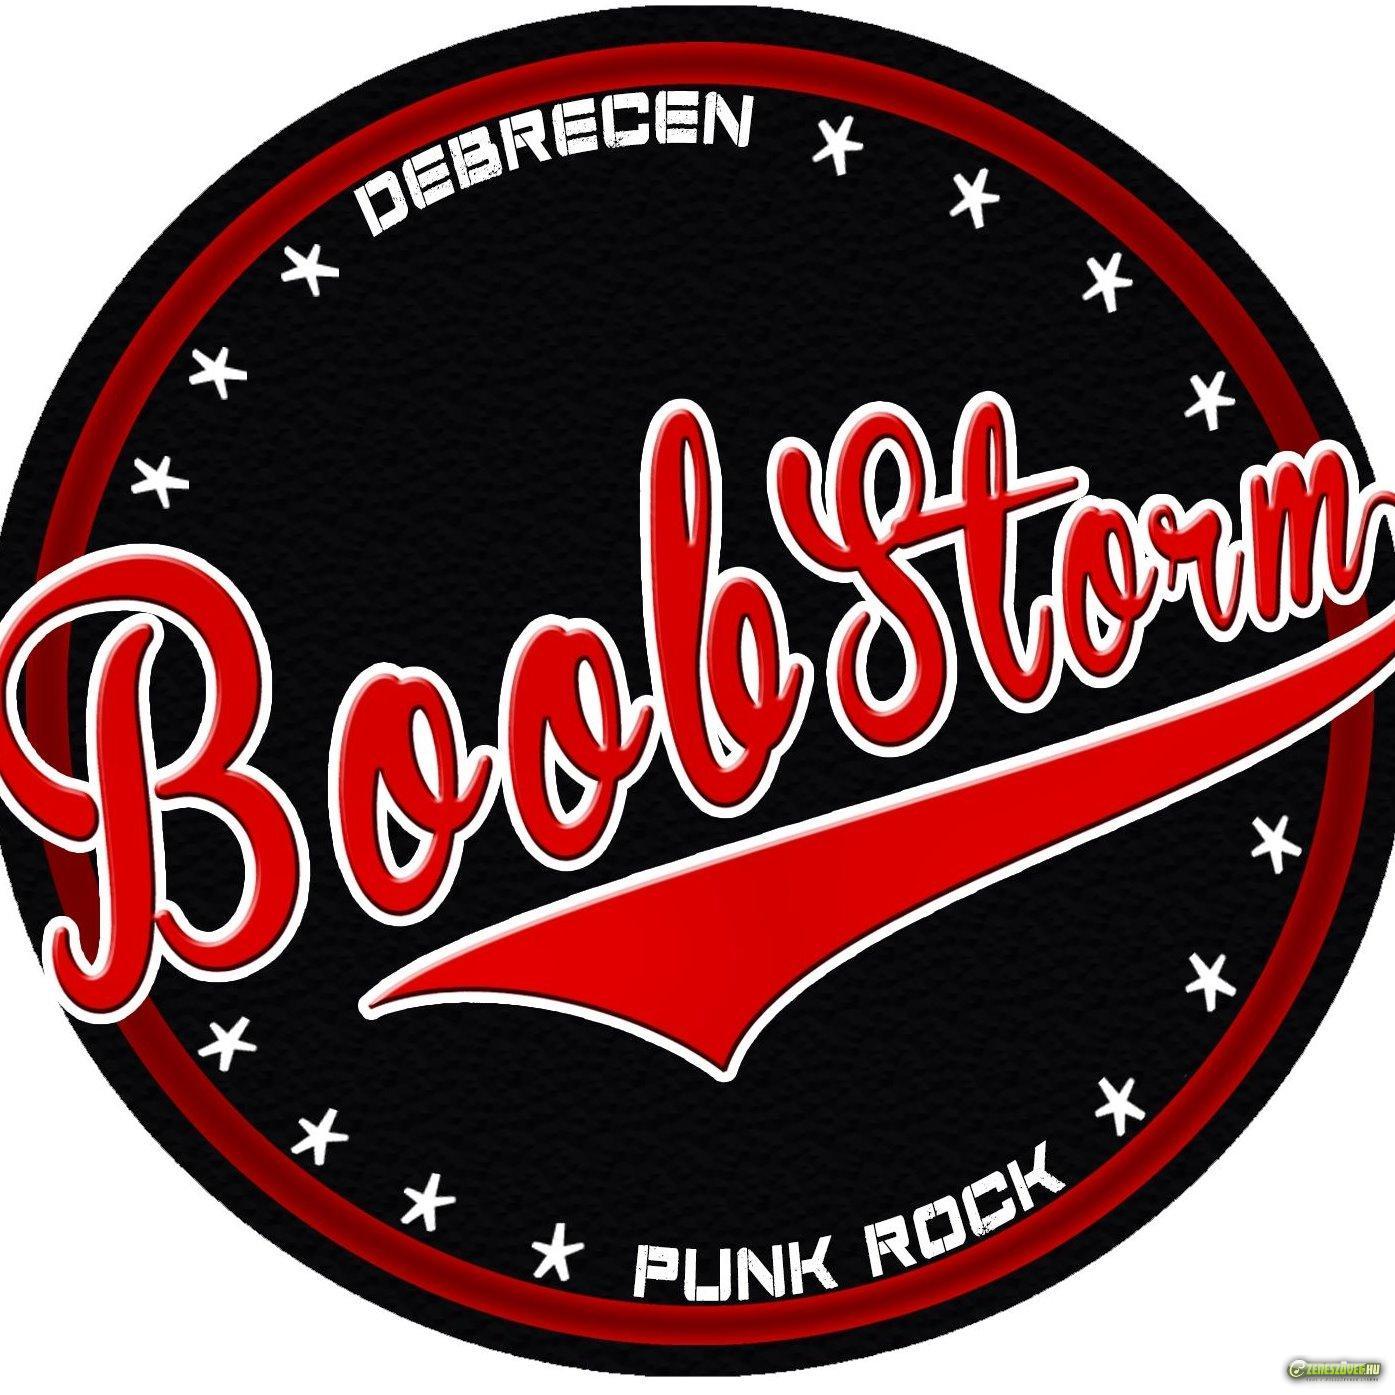 Boobstorm